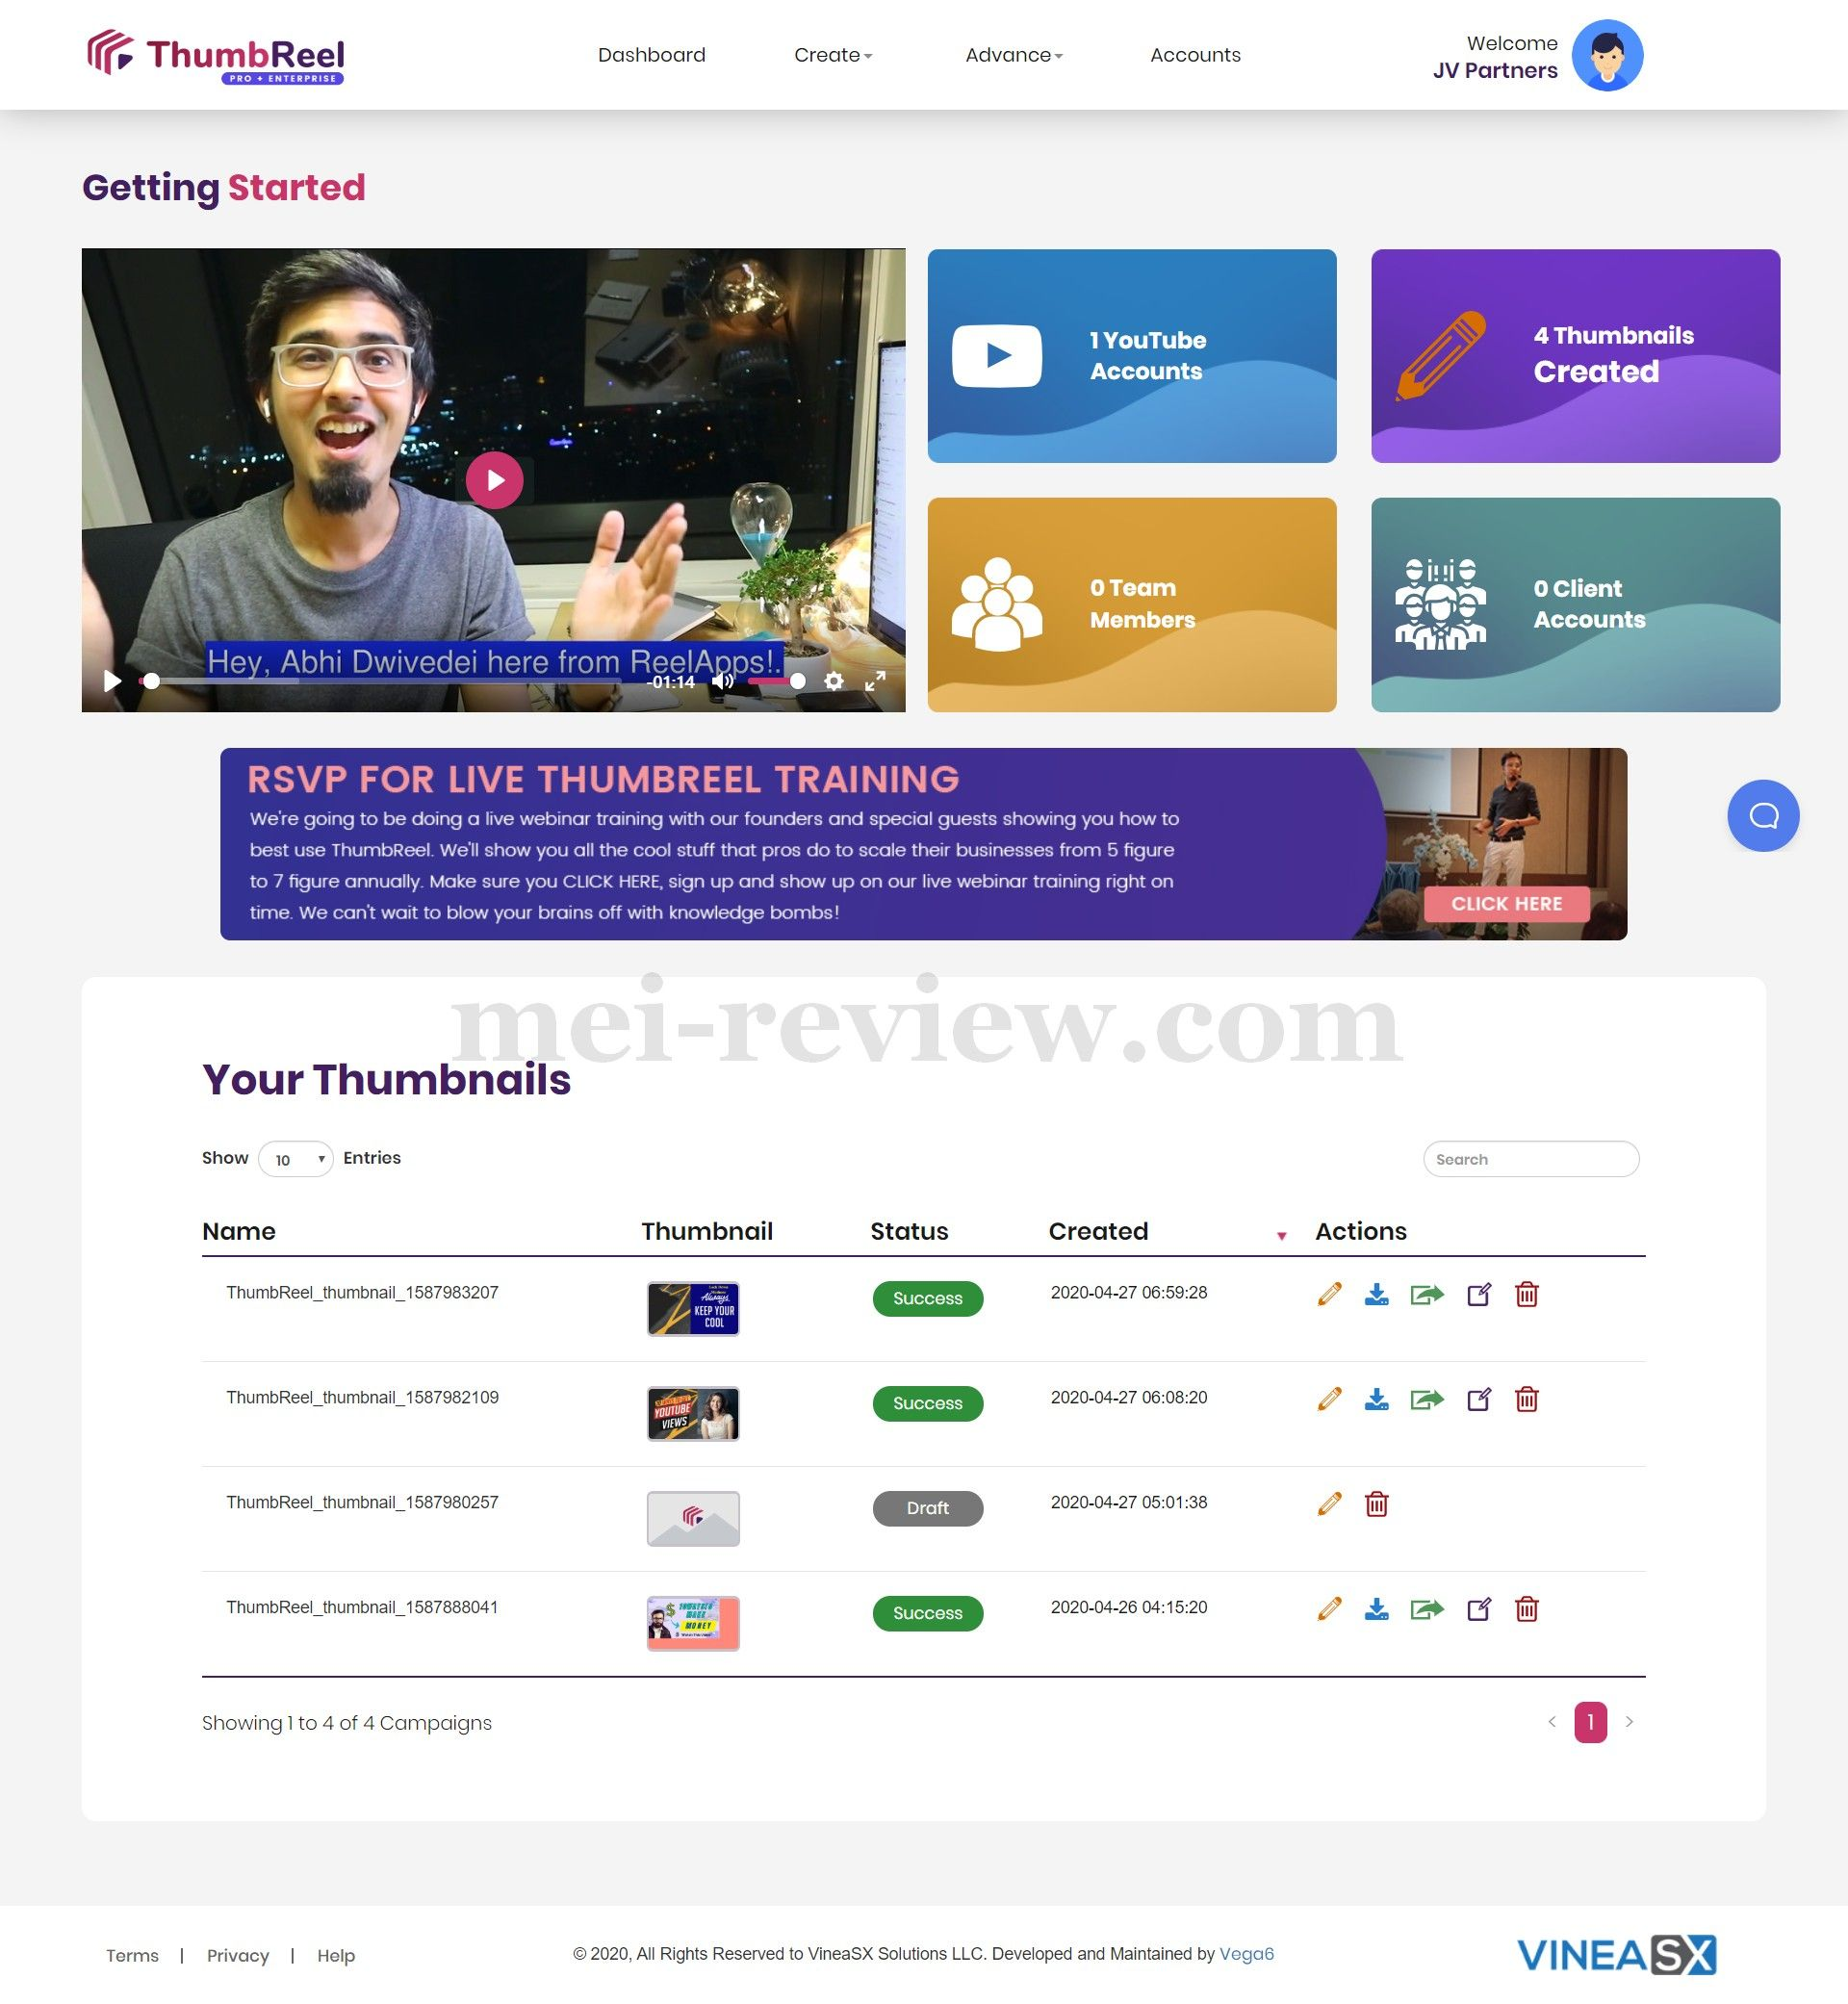 ThumbReel-Demo-1-Dashboard